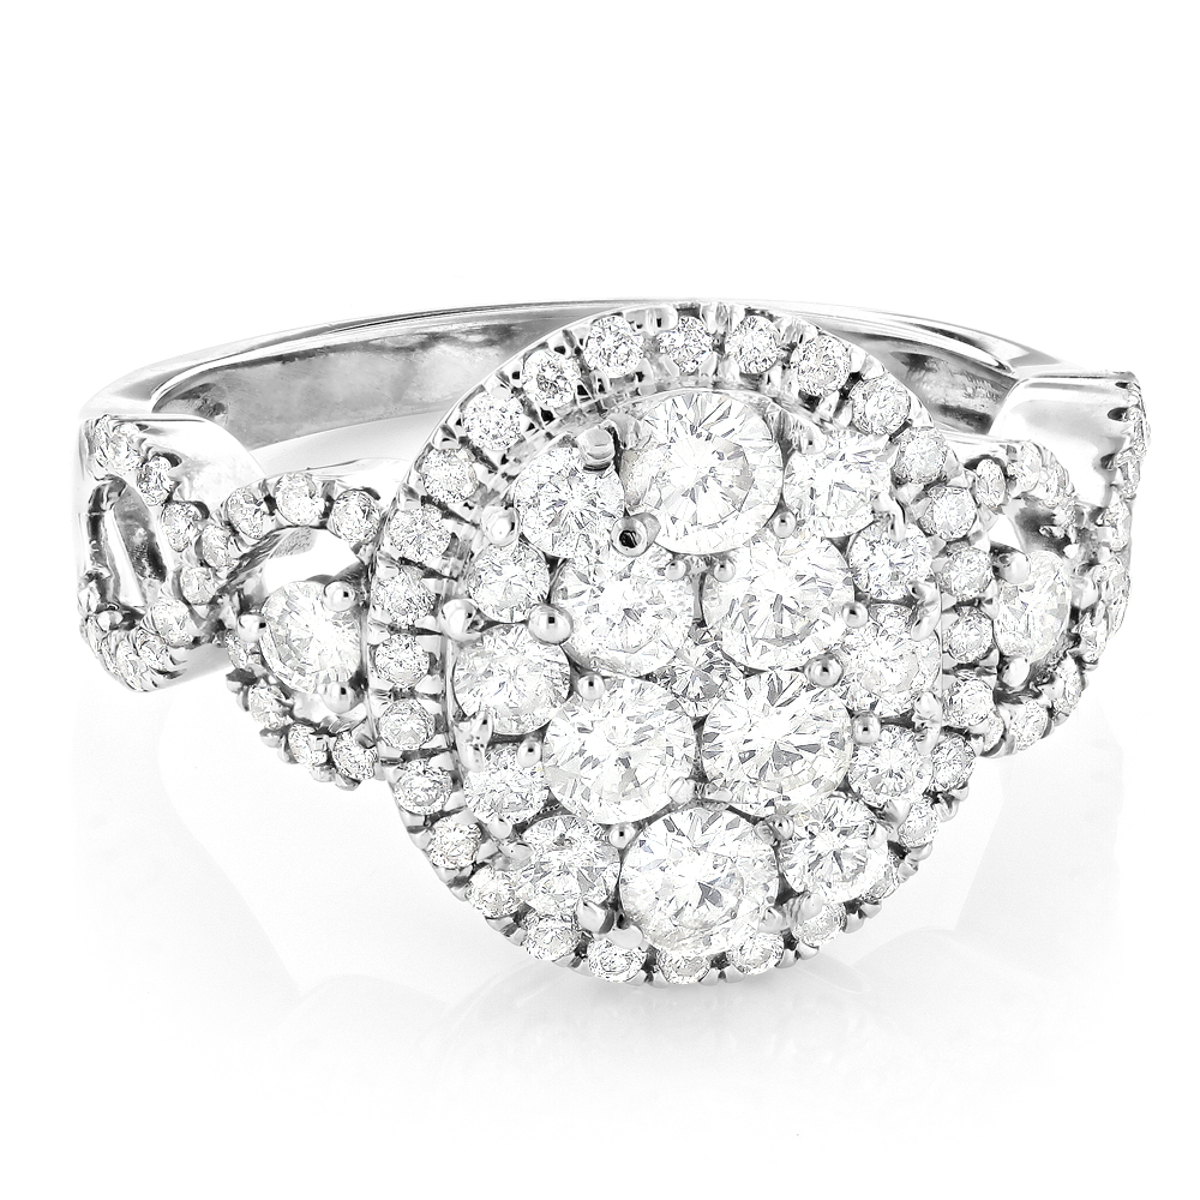 Large Diamond Cluster Engagement Ring 1.7ct 14K Gold